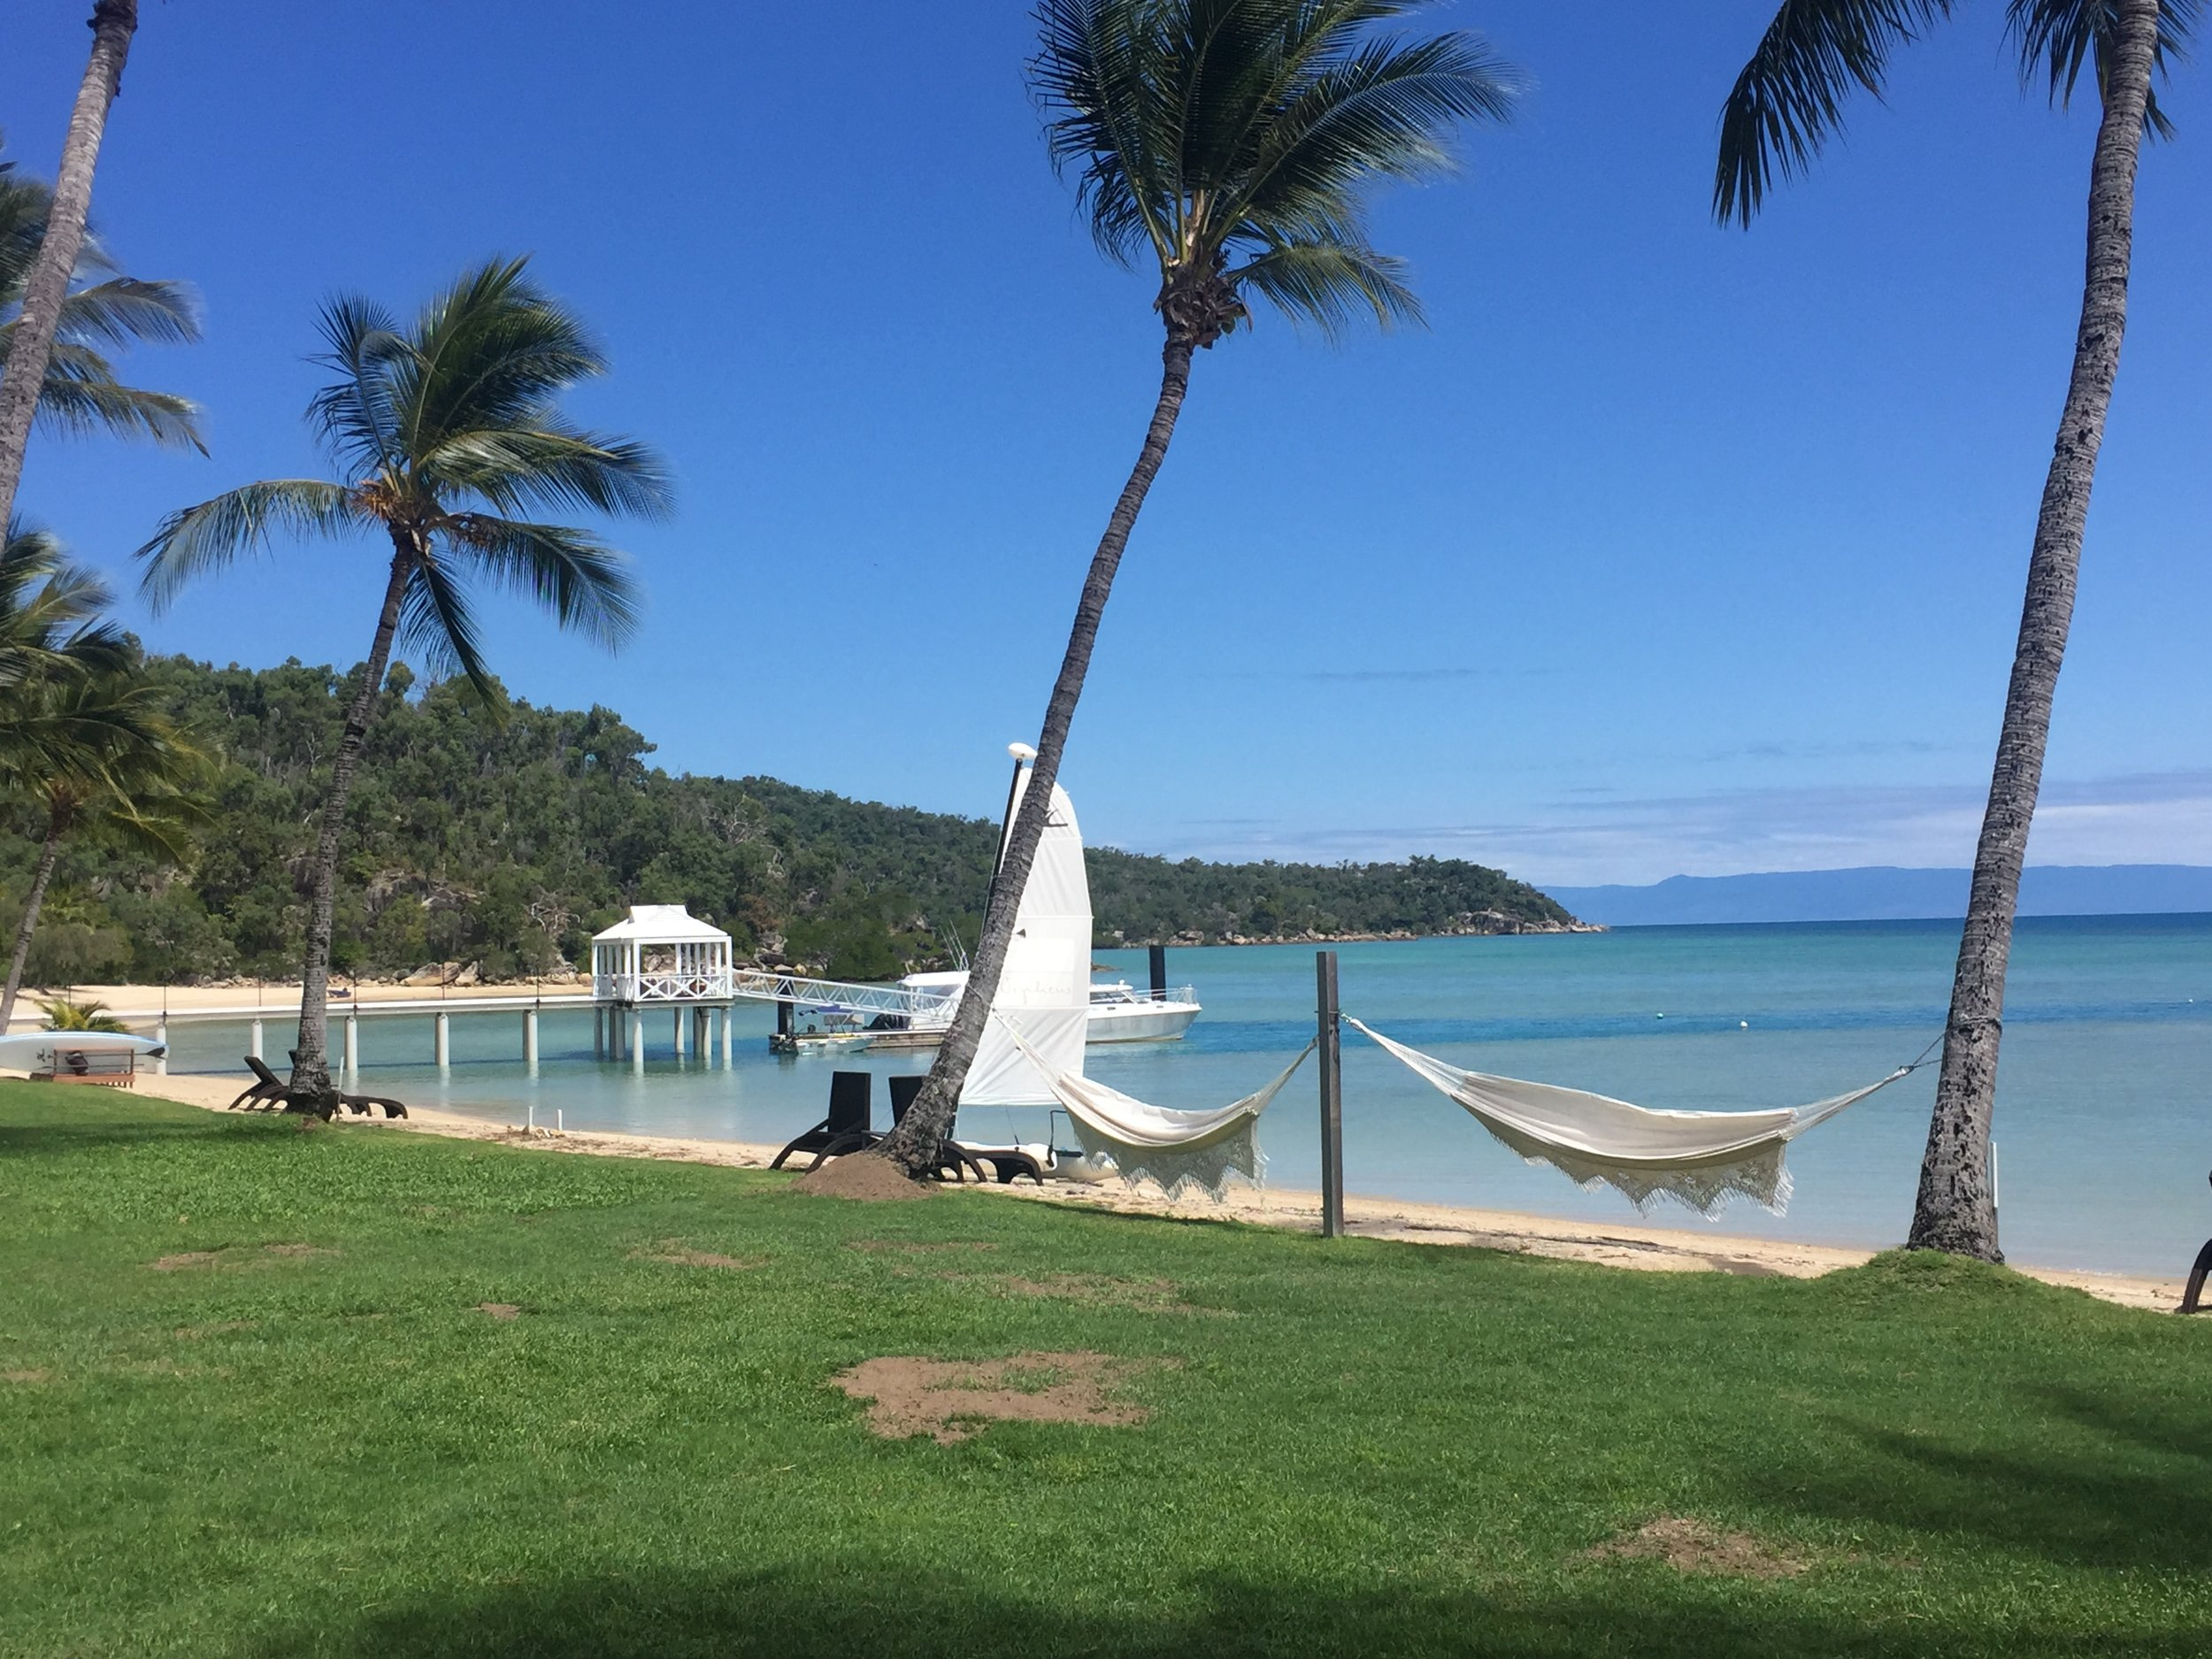 Lounge on the beach